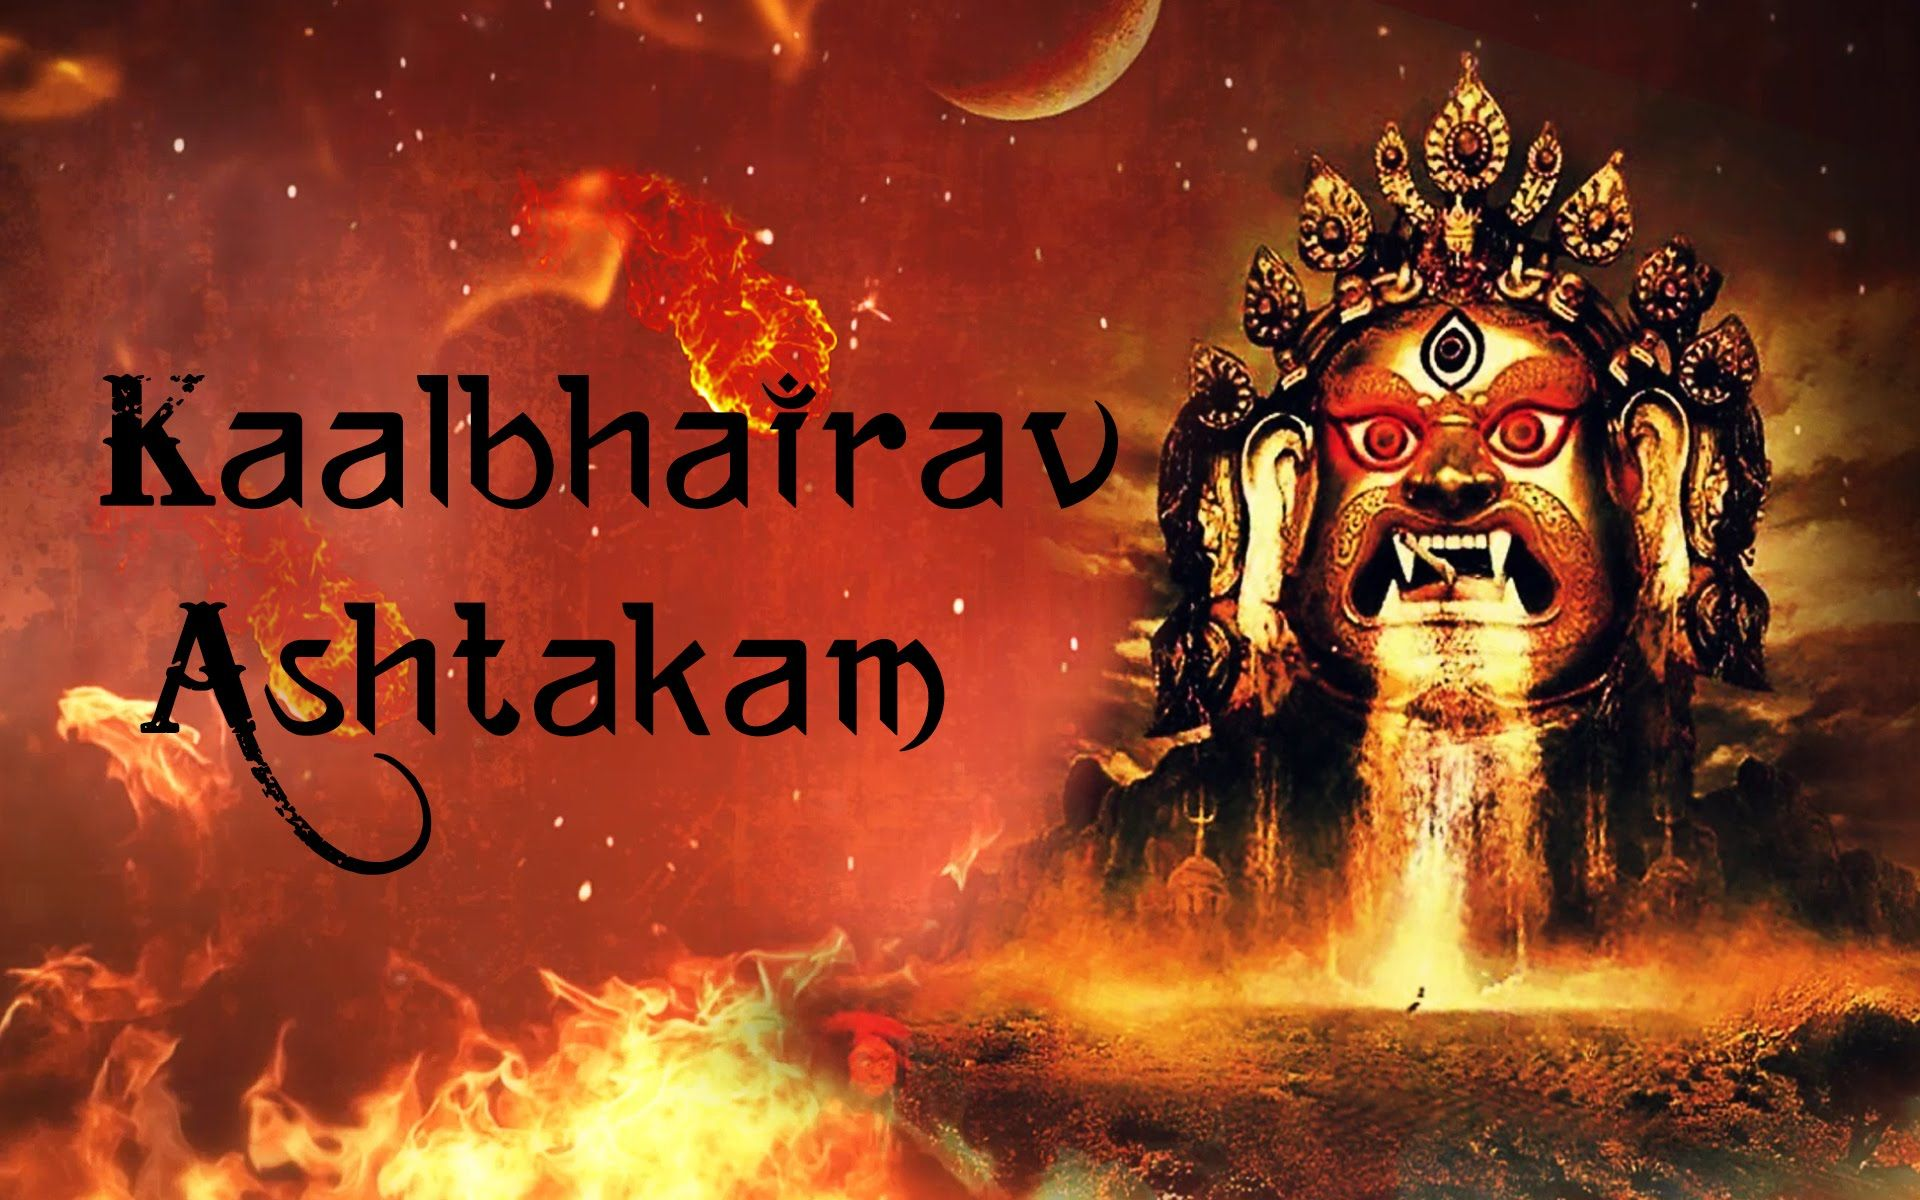 Pdf tamil in ashtakam kalabhairava